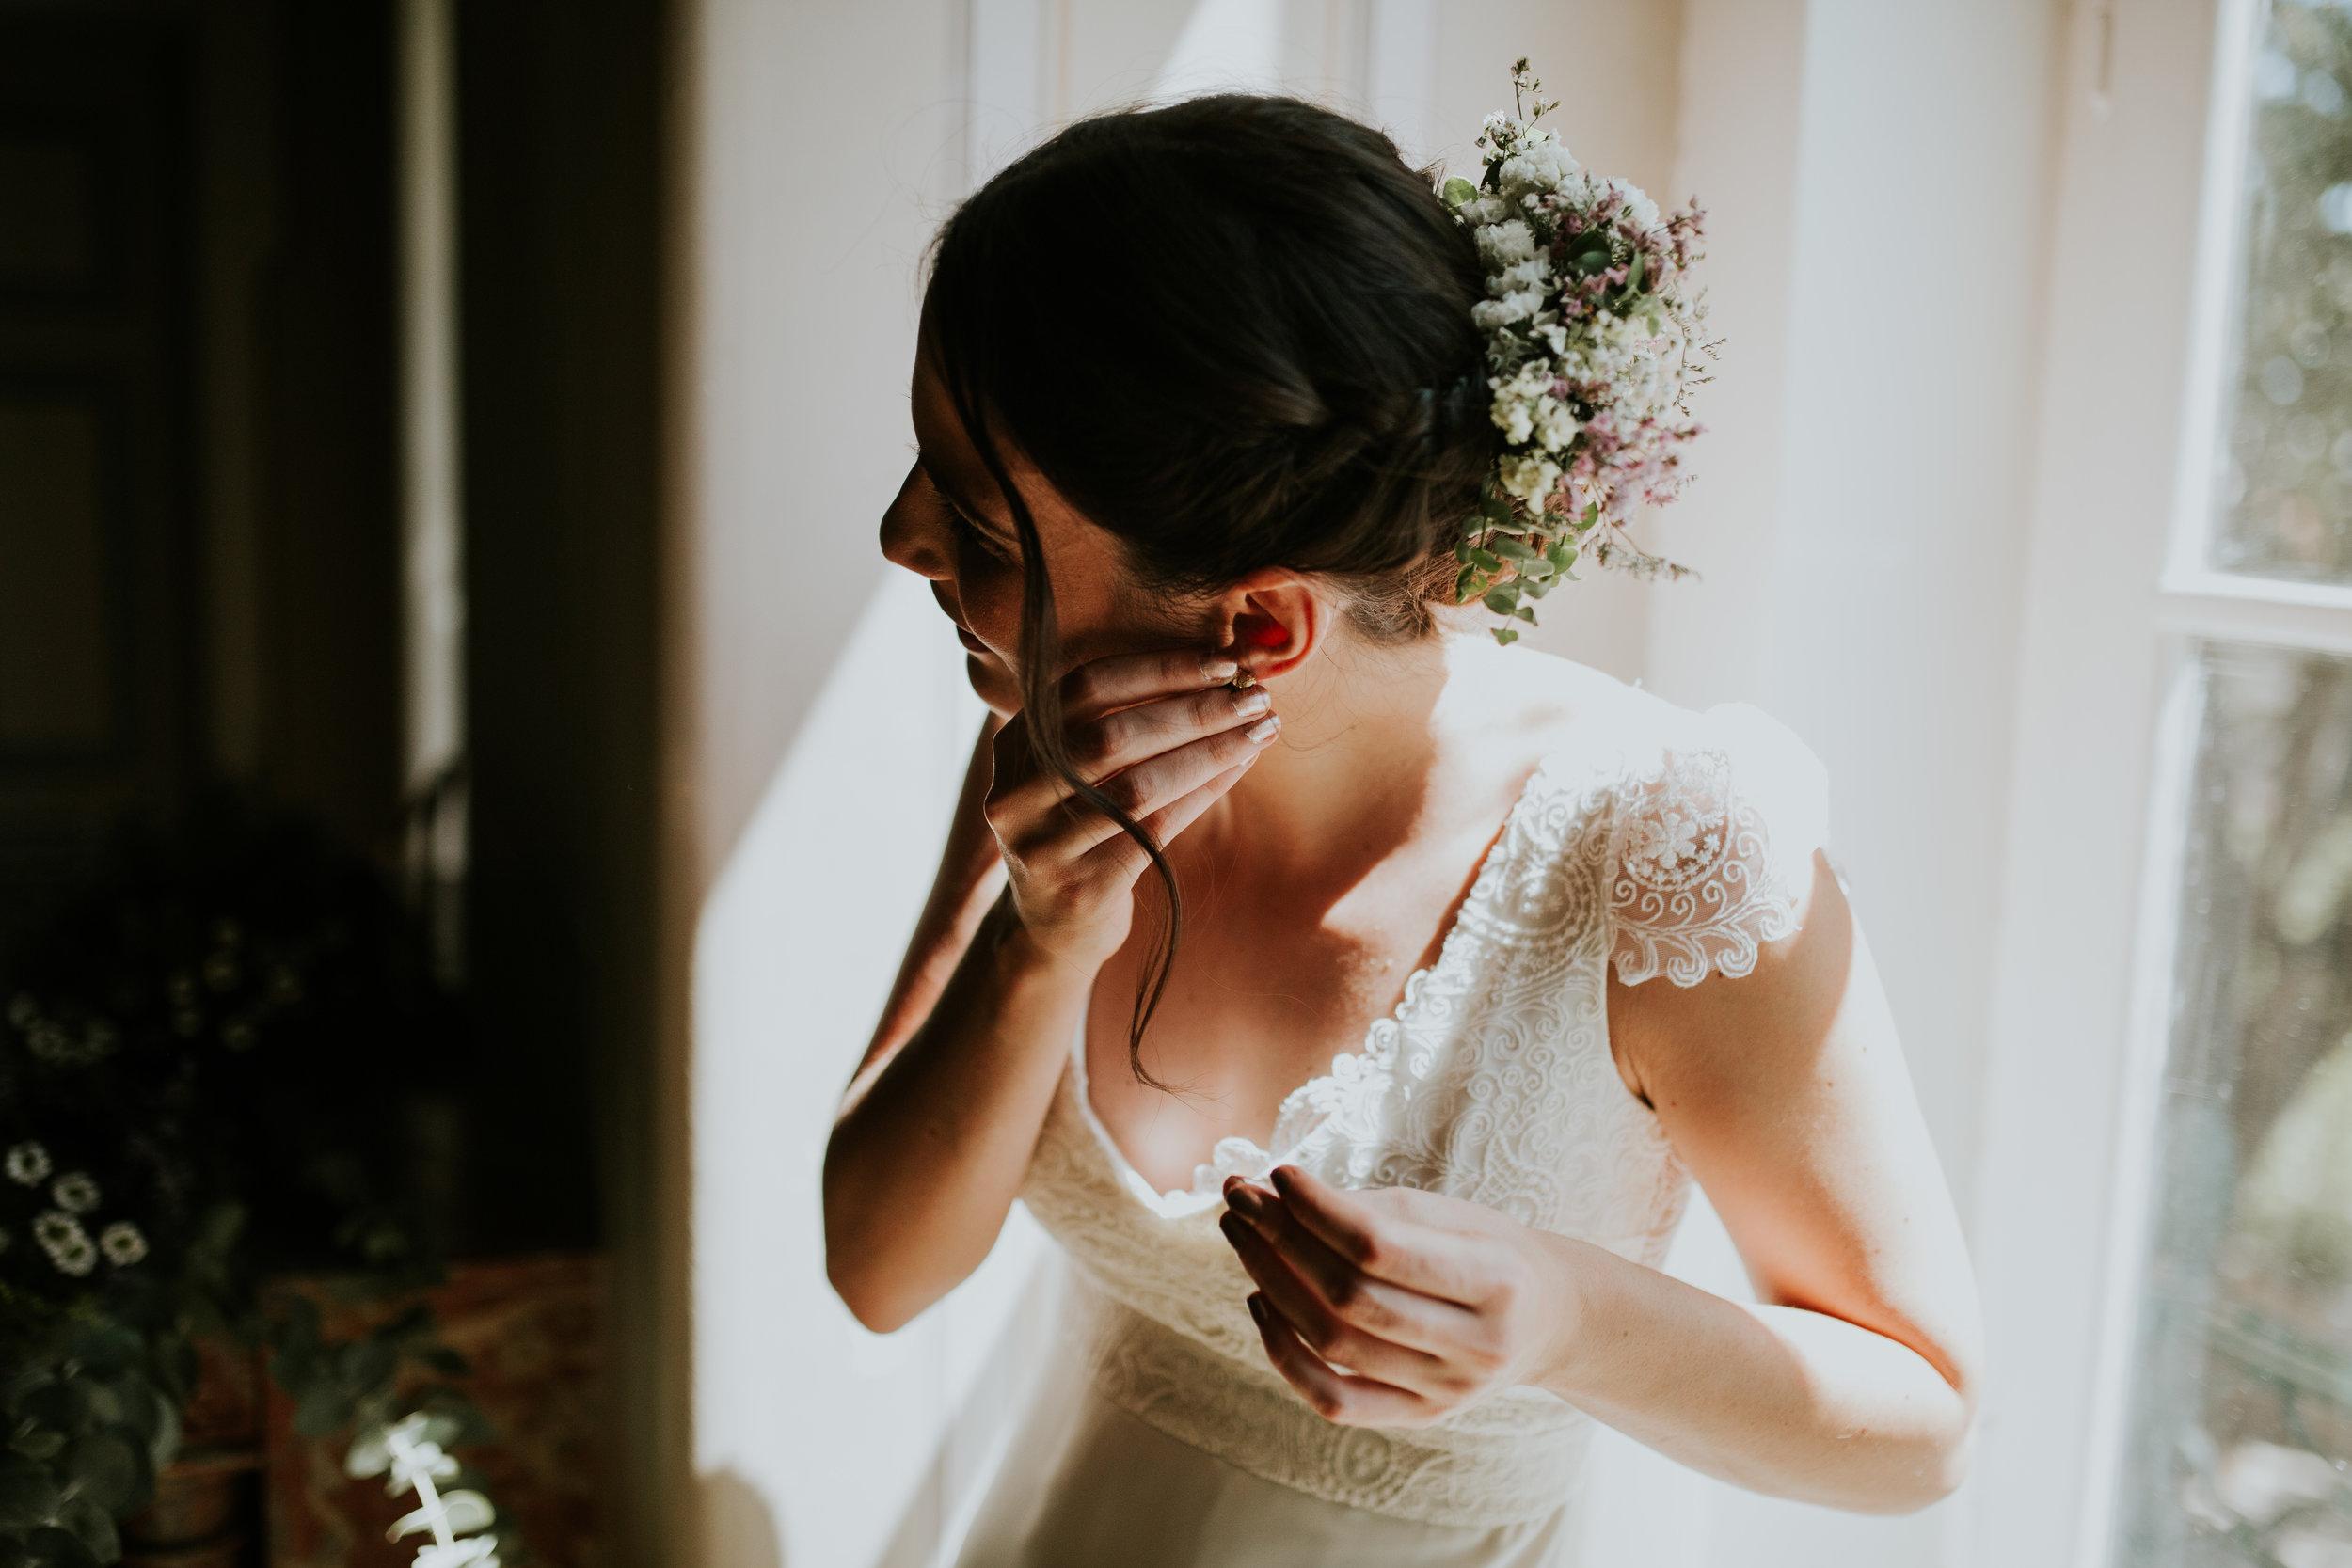 J&P 109_ 02 setembro 2017 Wedding day_.jpg